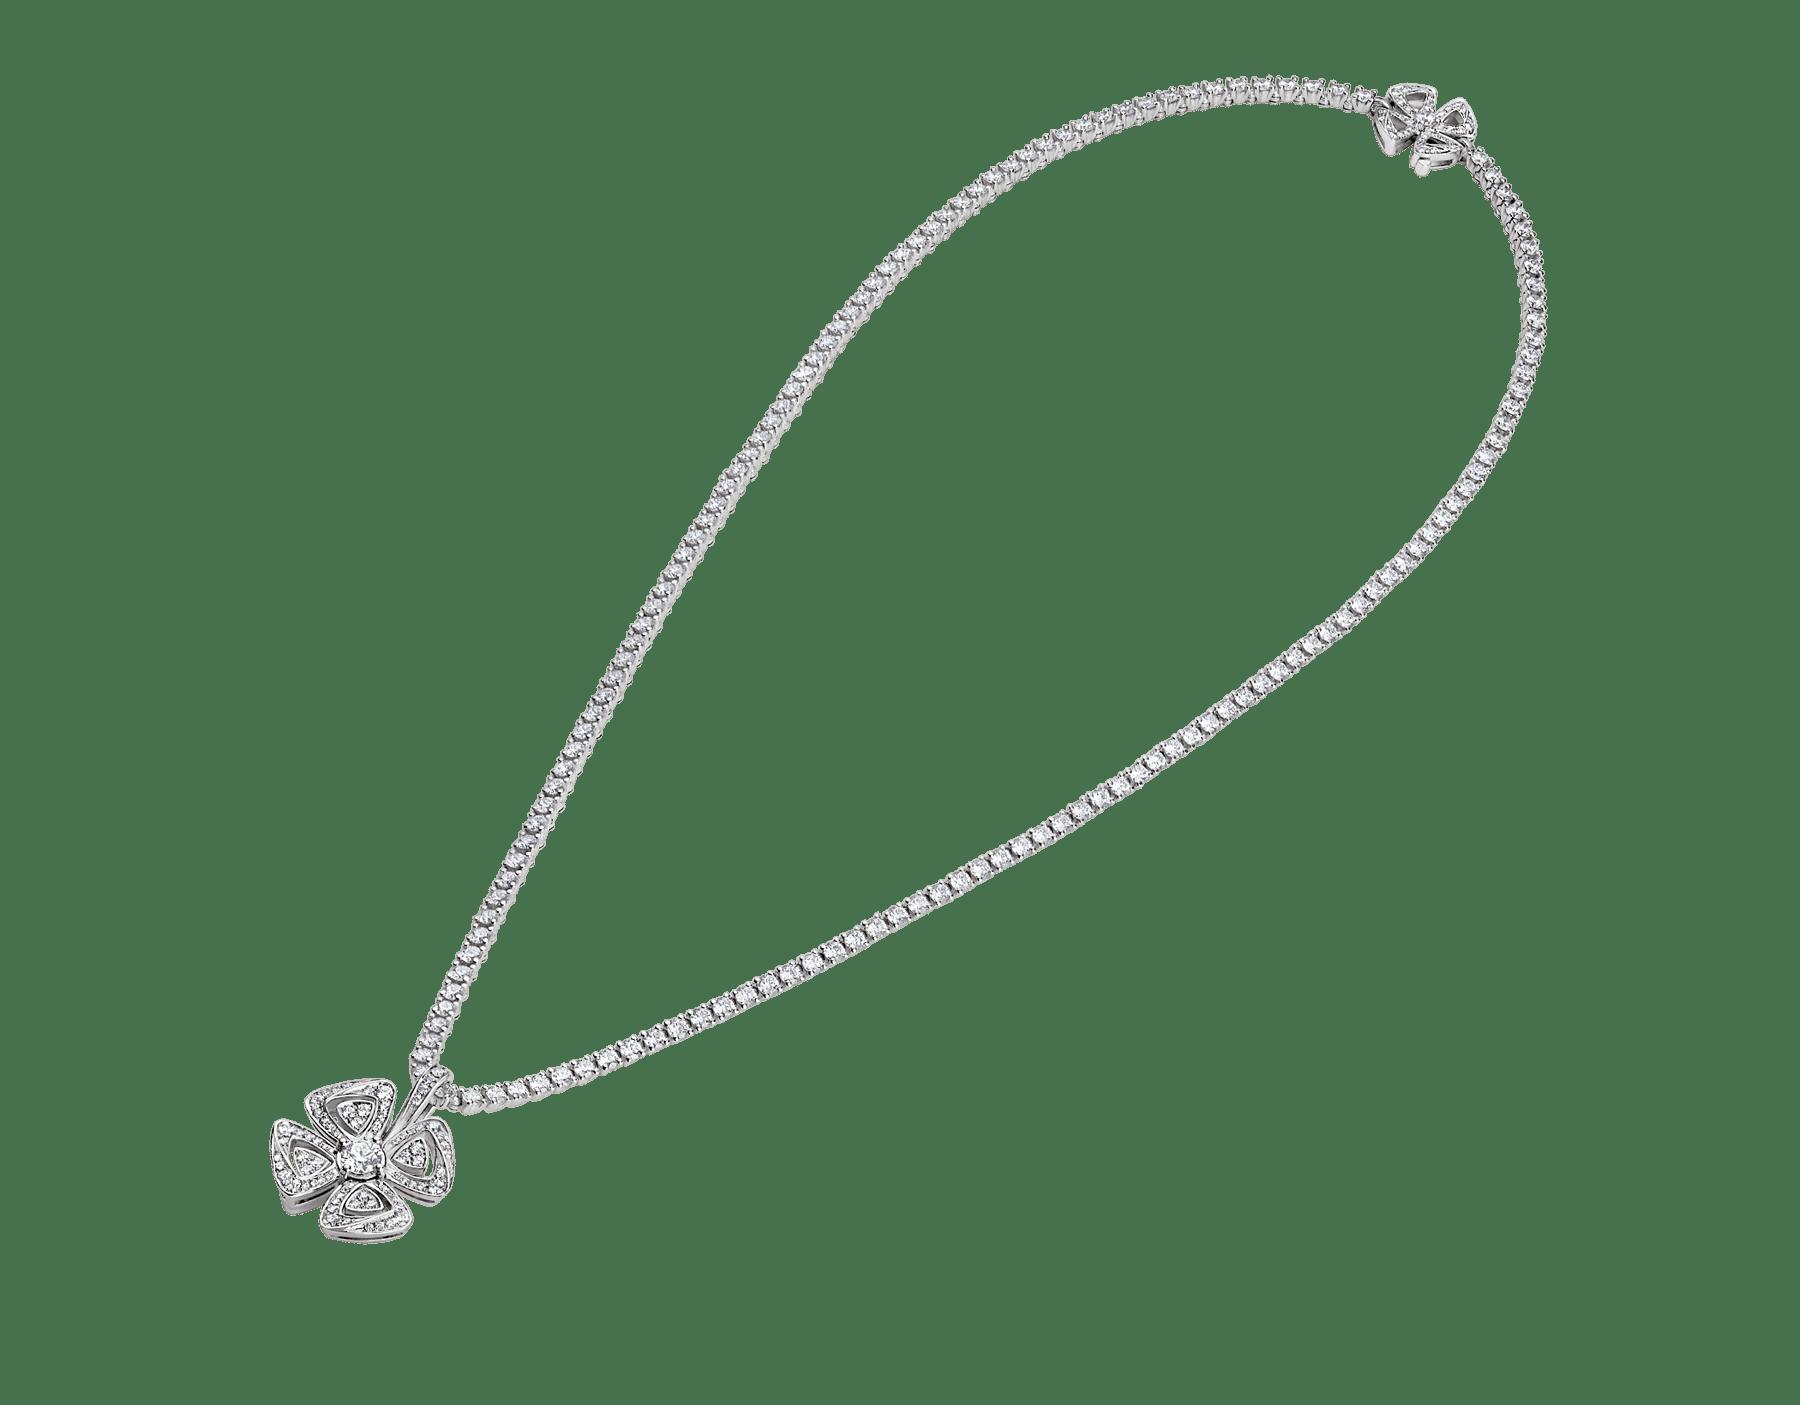 Fiorever 18 kt white gold convertible pendant necklace set with brilliant-cut diamonds (5.55 ct) and pavé diamonds (0.41 ct) 358351 image 2